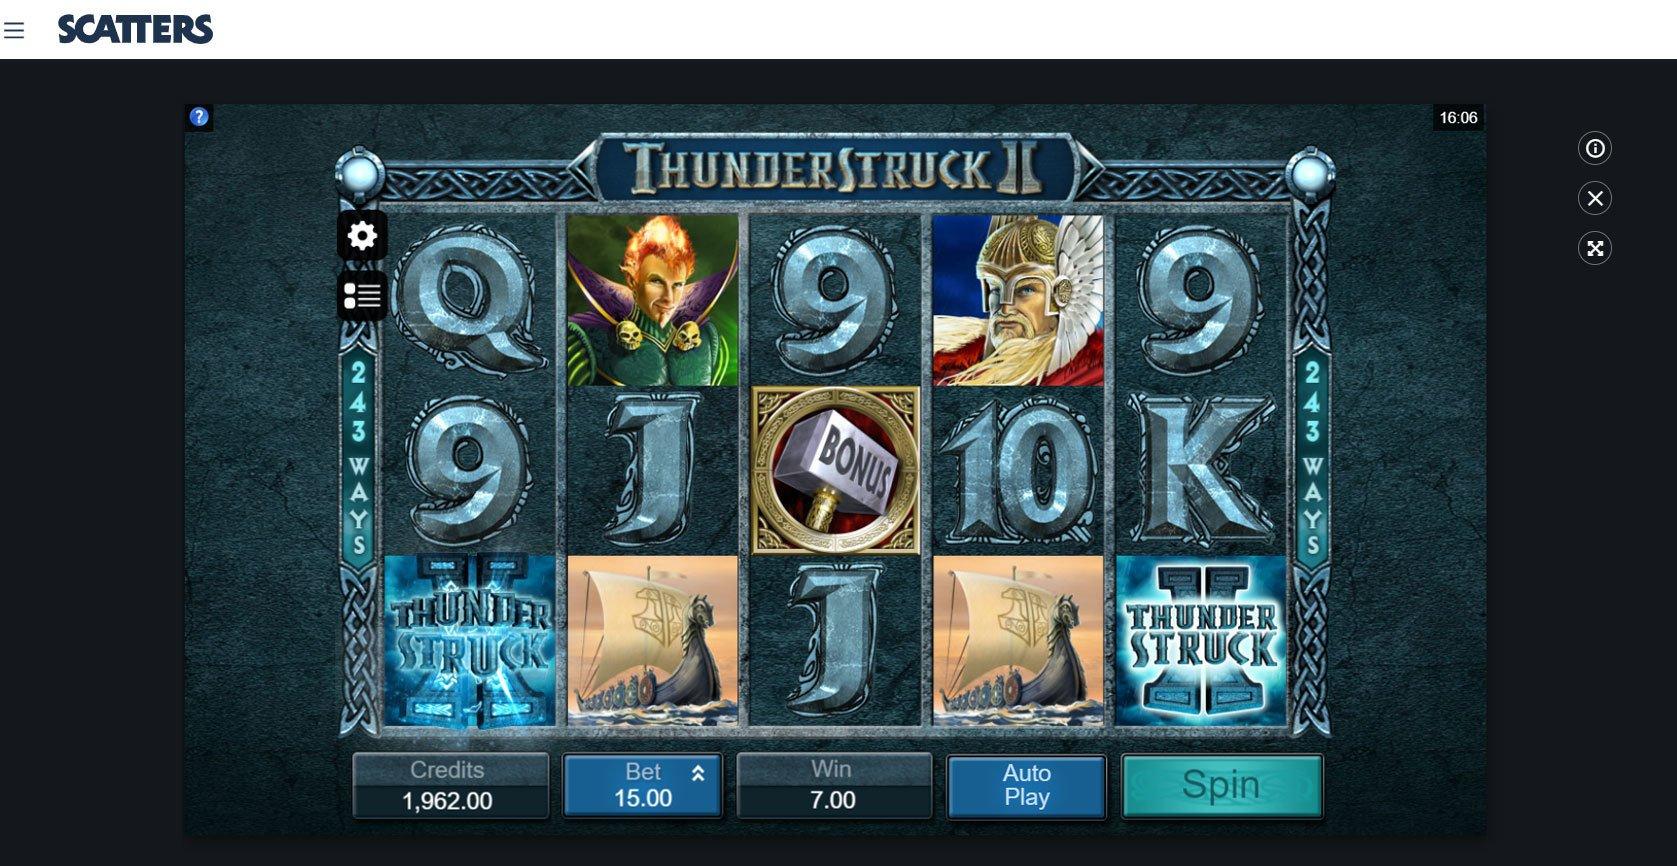 Thunderstruck II Online Slot - Scatters Slots Casino